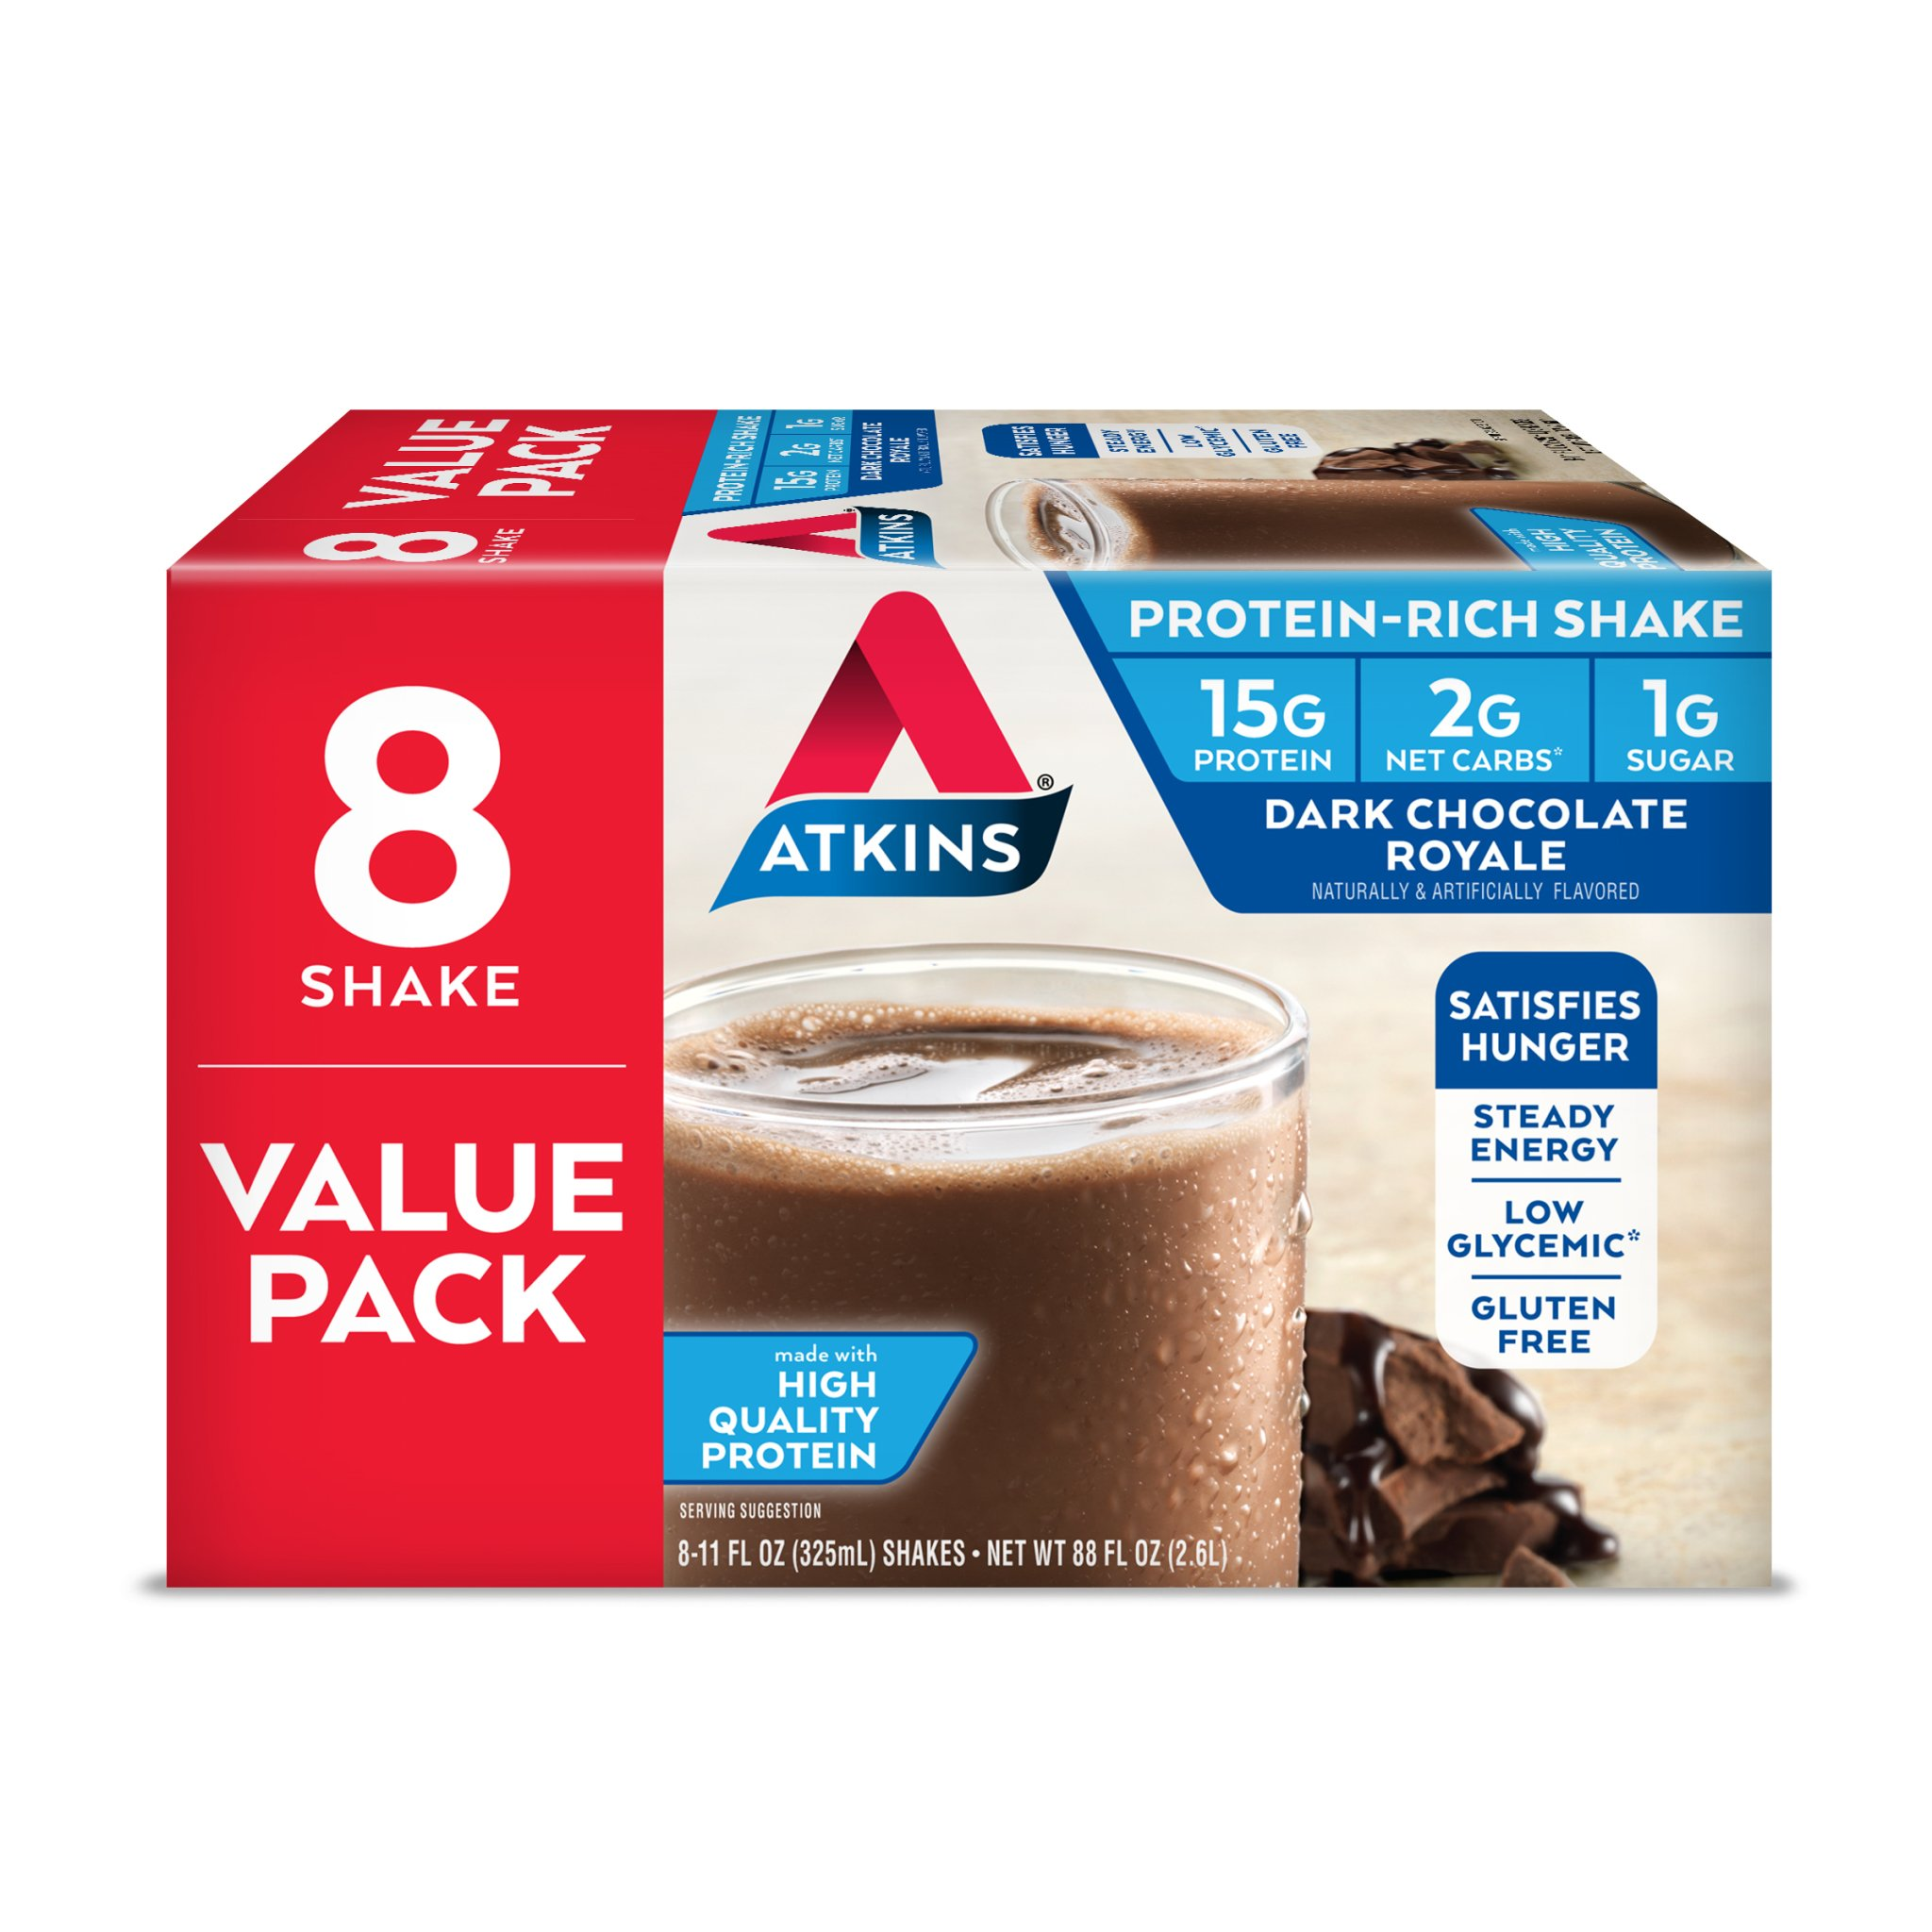 Atkins Gluten Free Protein-Rich Shake, Dark Chocolate Royale, Keto Friendly, 8 Count by Atkins